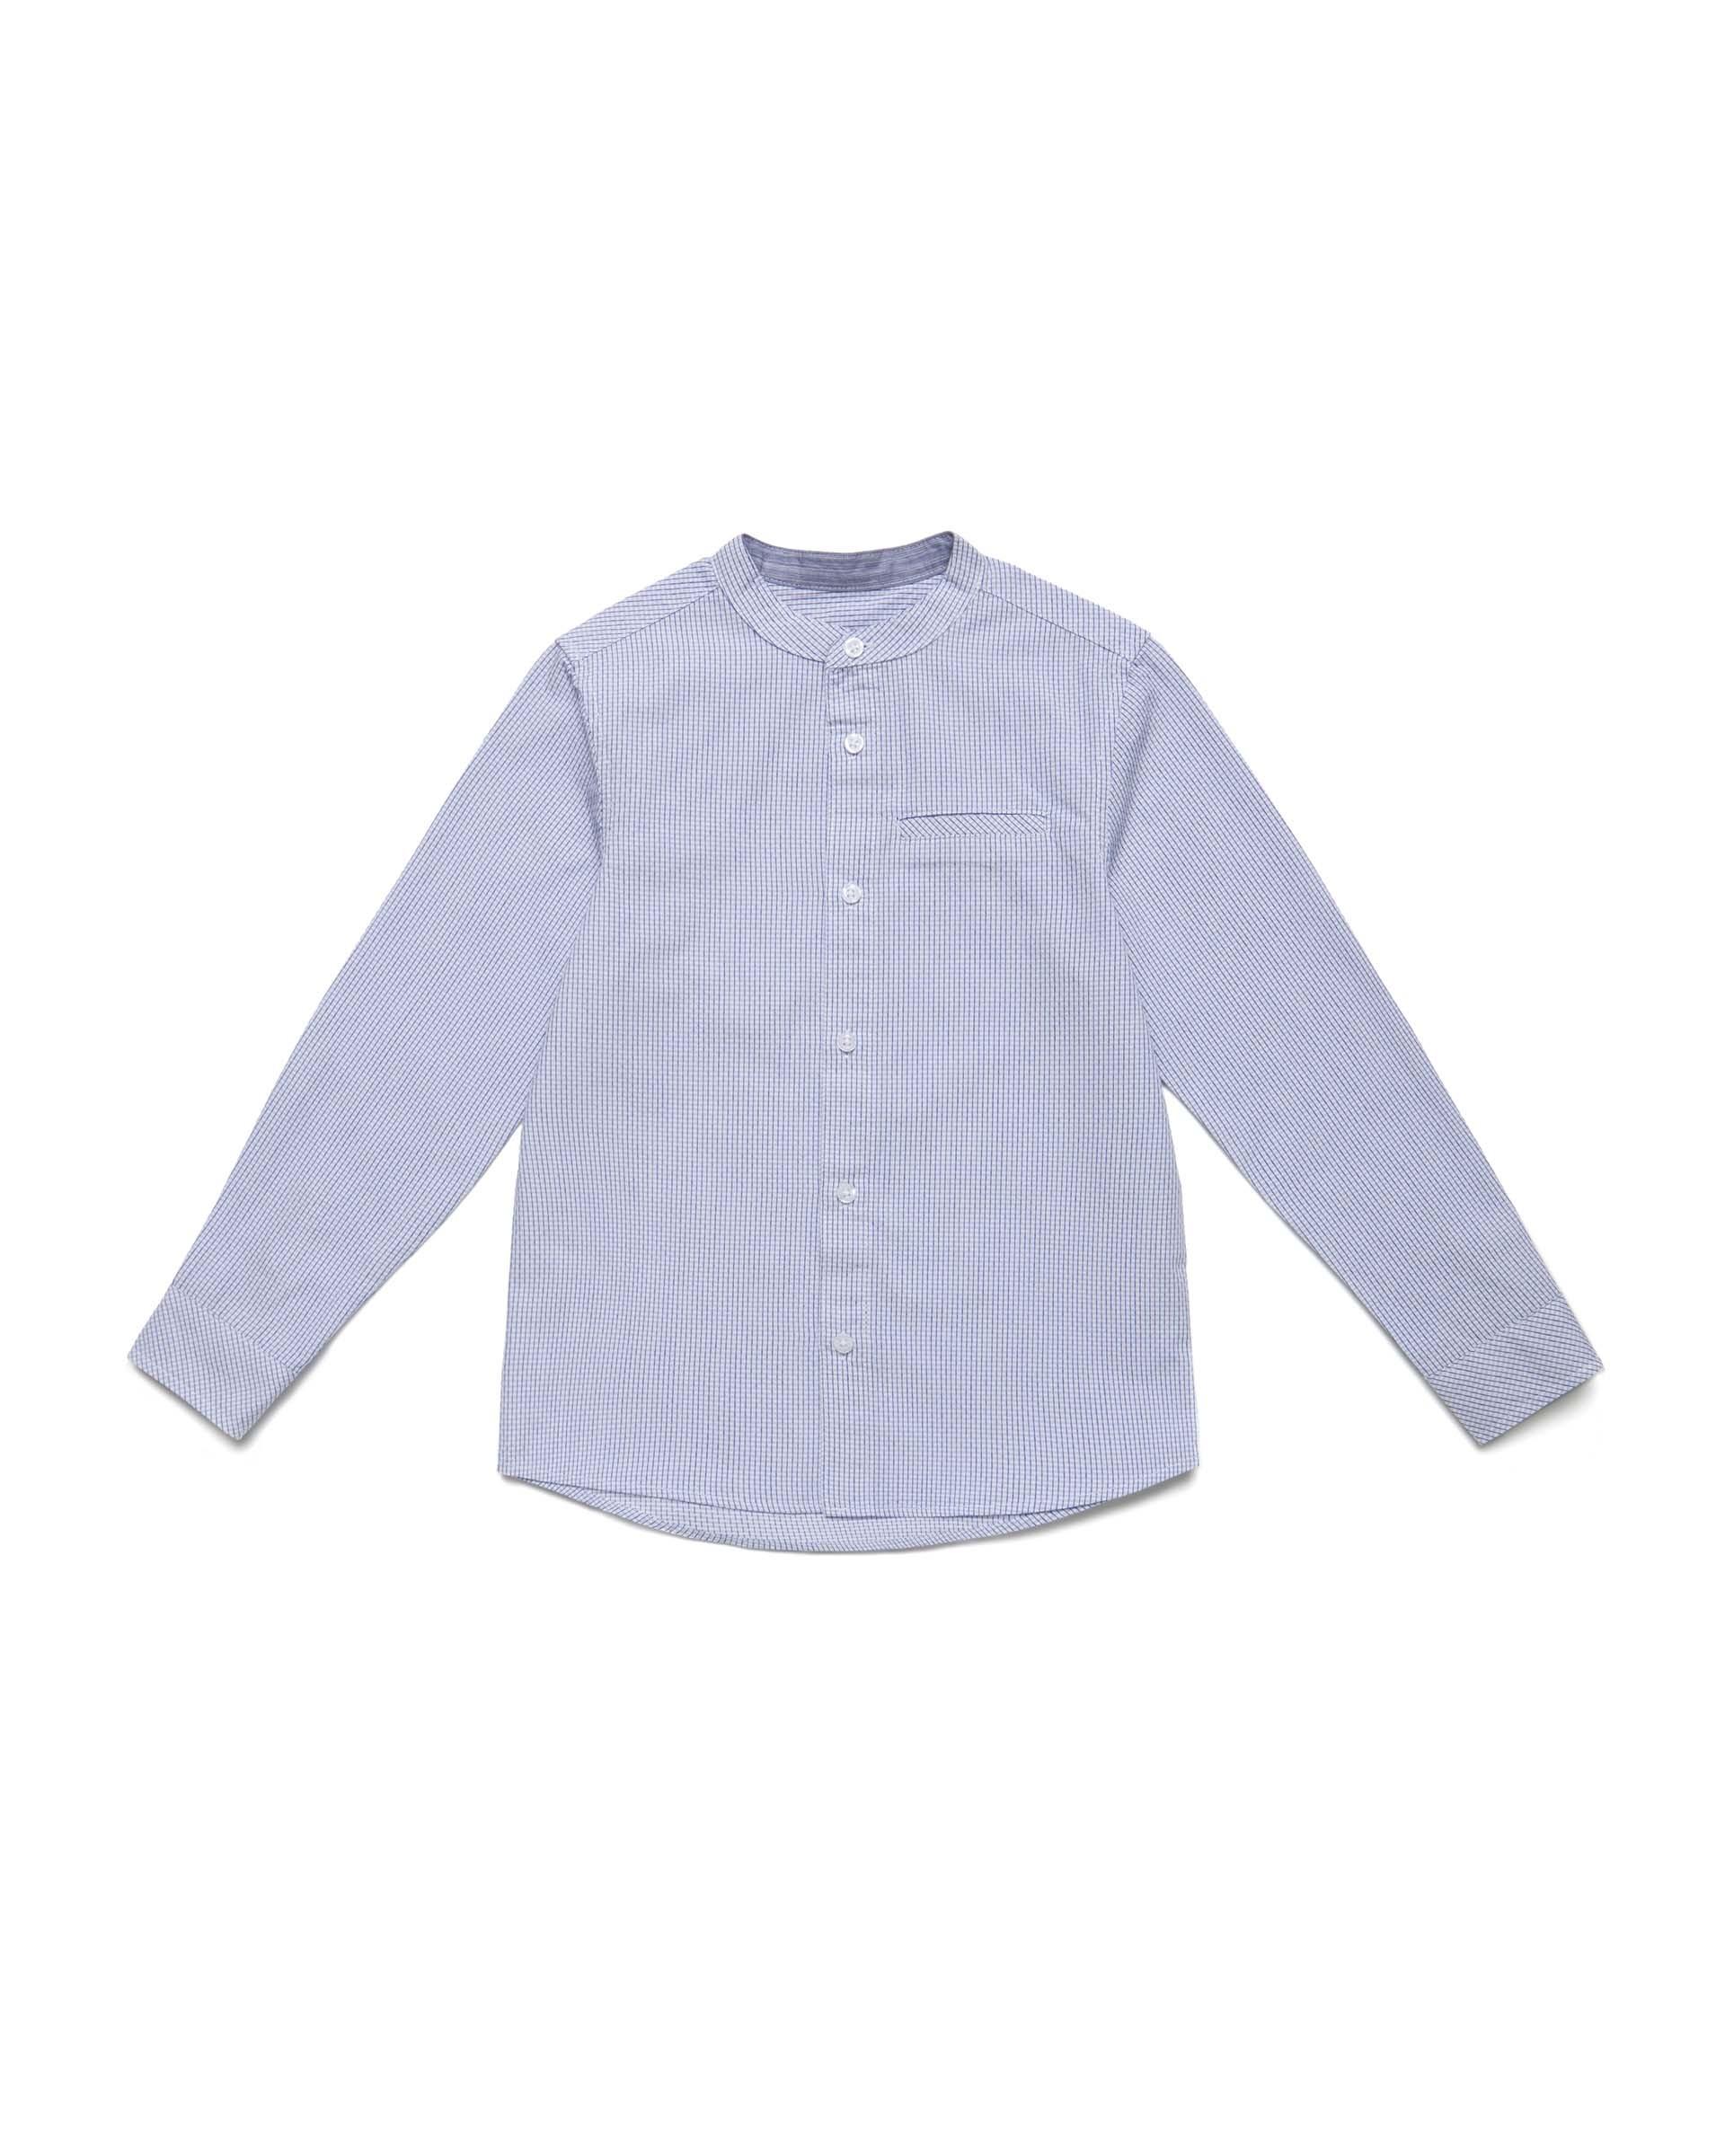 Купить 20P_5PC45QHA0_902, Рубашка для мальчиков Benetton 5PC45QHA0_902 р-р 152, United Colors of Benetton, Рубашки для мальчиков